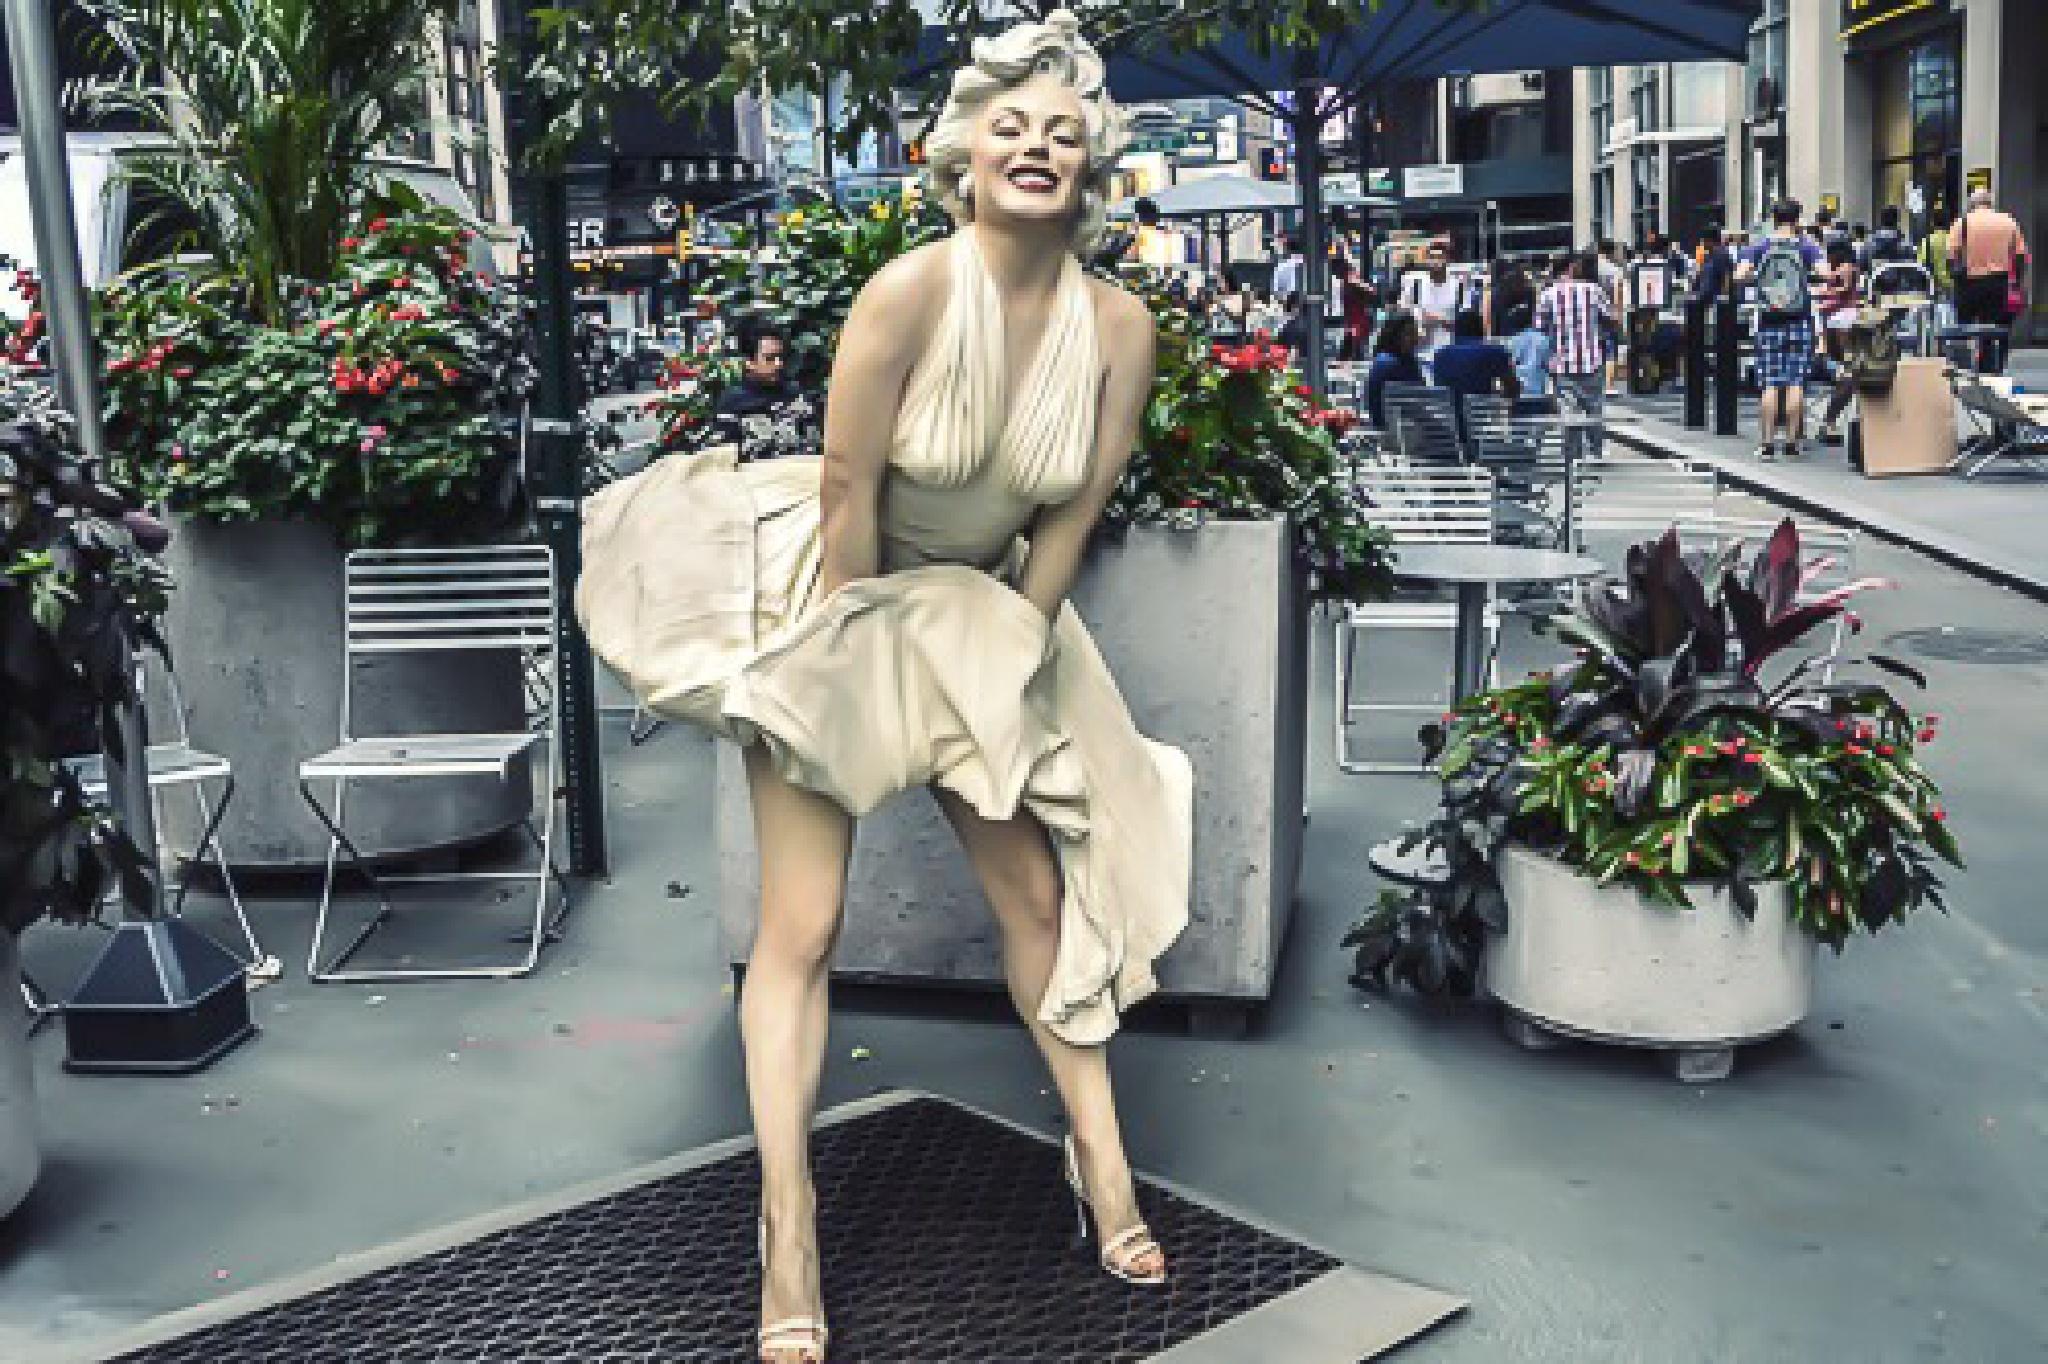 MM Street Art in New York City by Seward Johnson  by Sharon Winter-Schorr